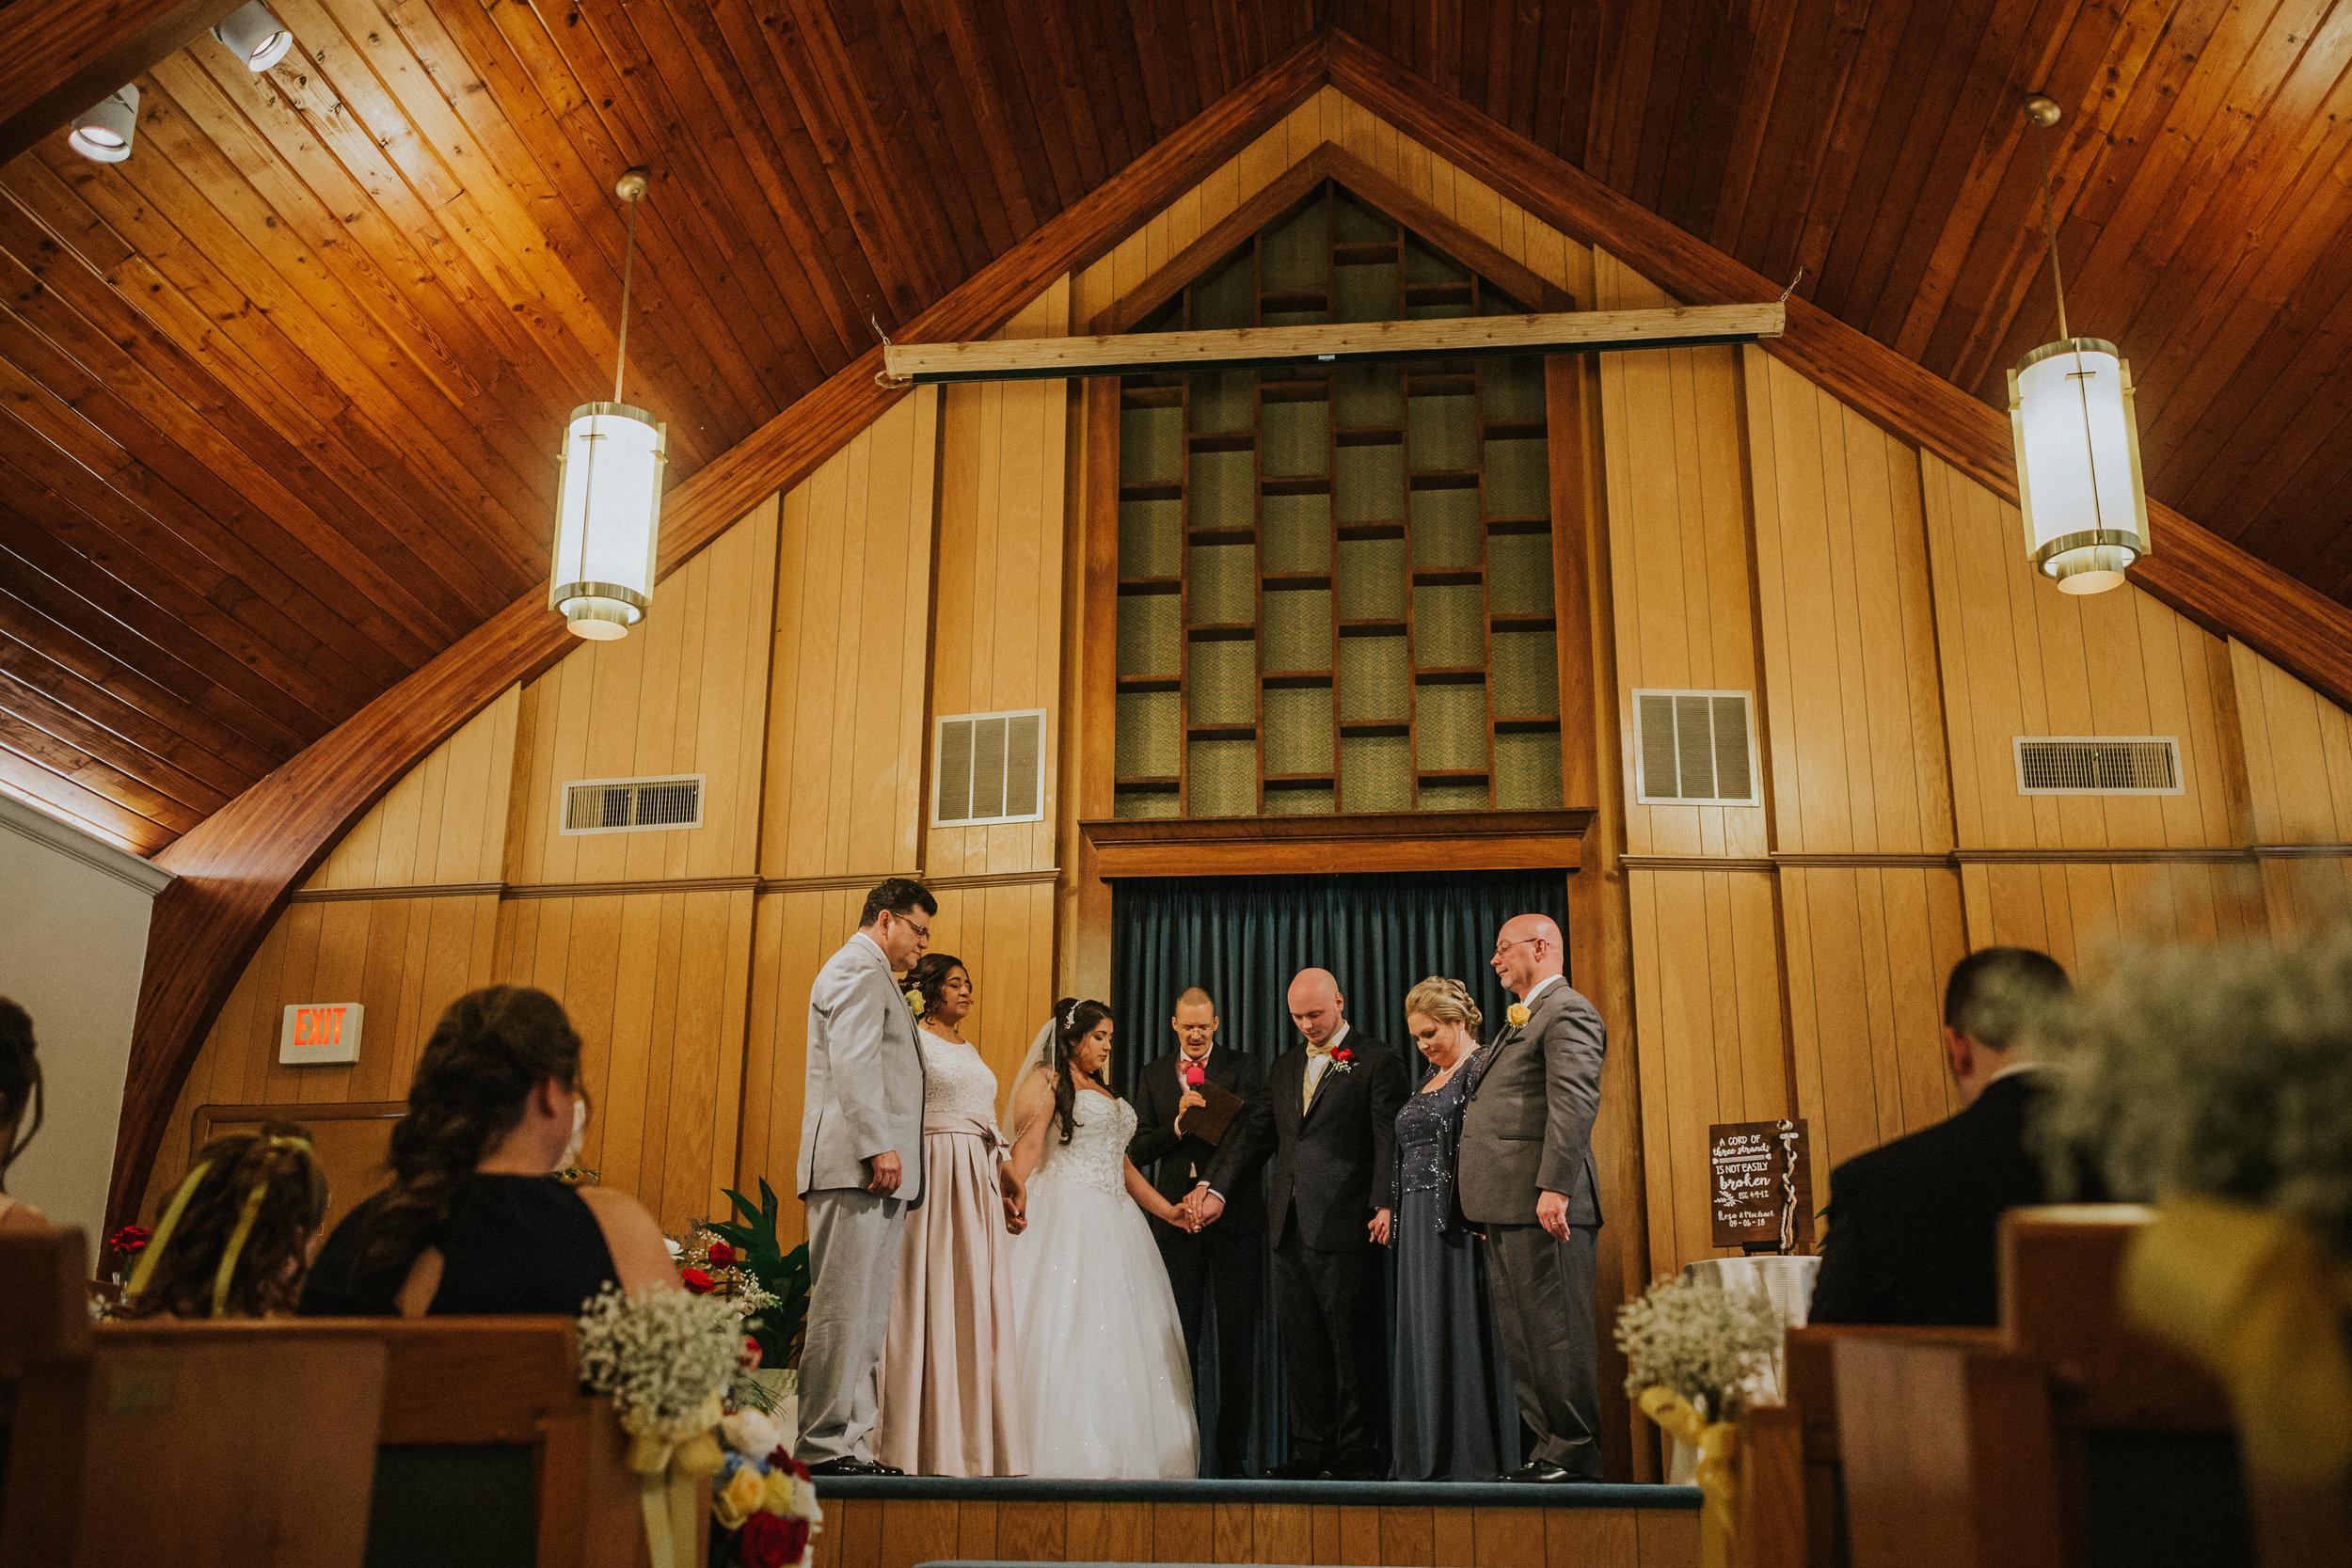 Barclay-Farmstead-Wedding-Rosa-and-Mike-293.jpg